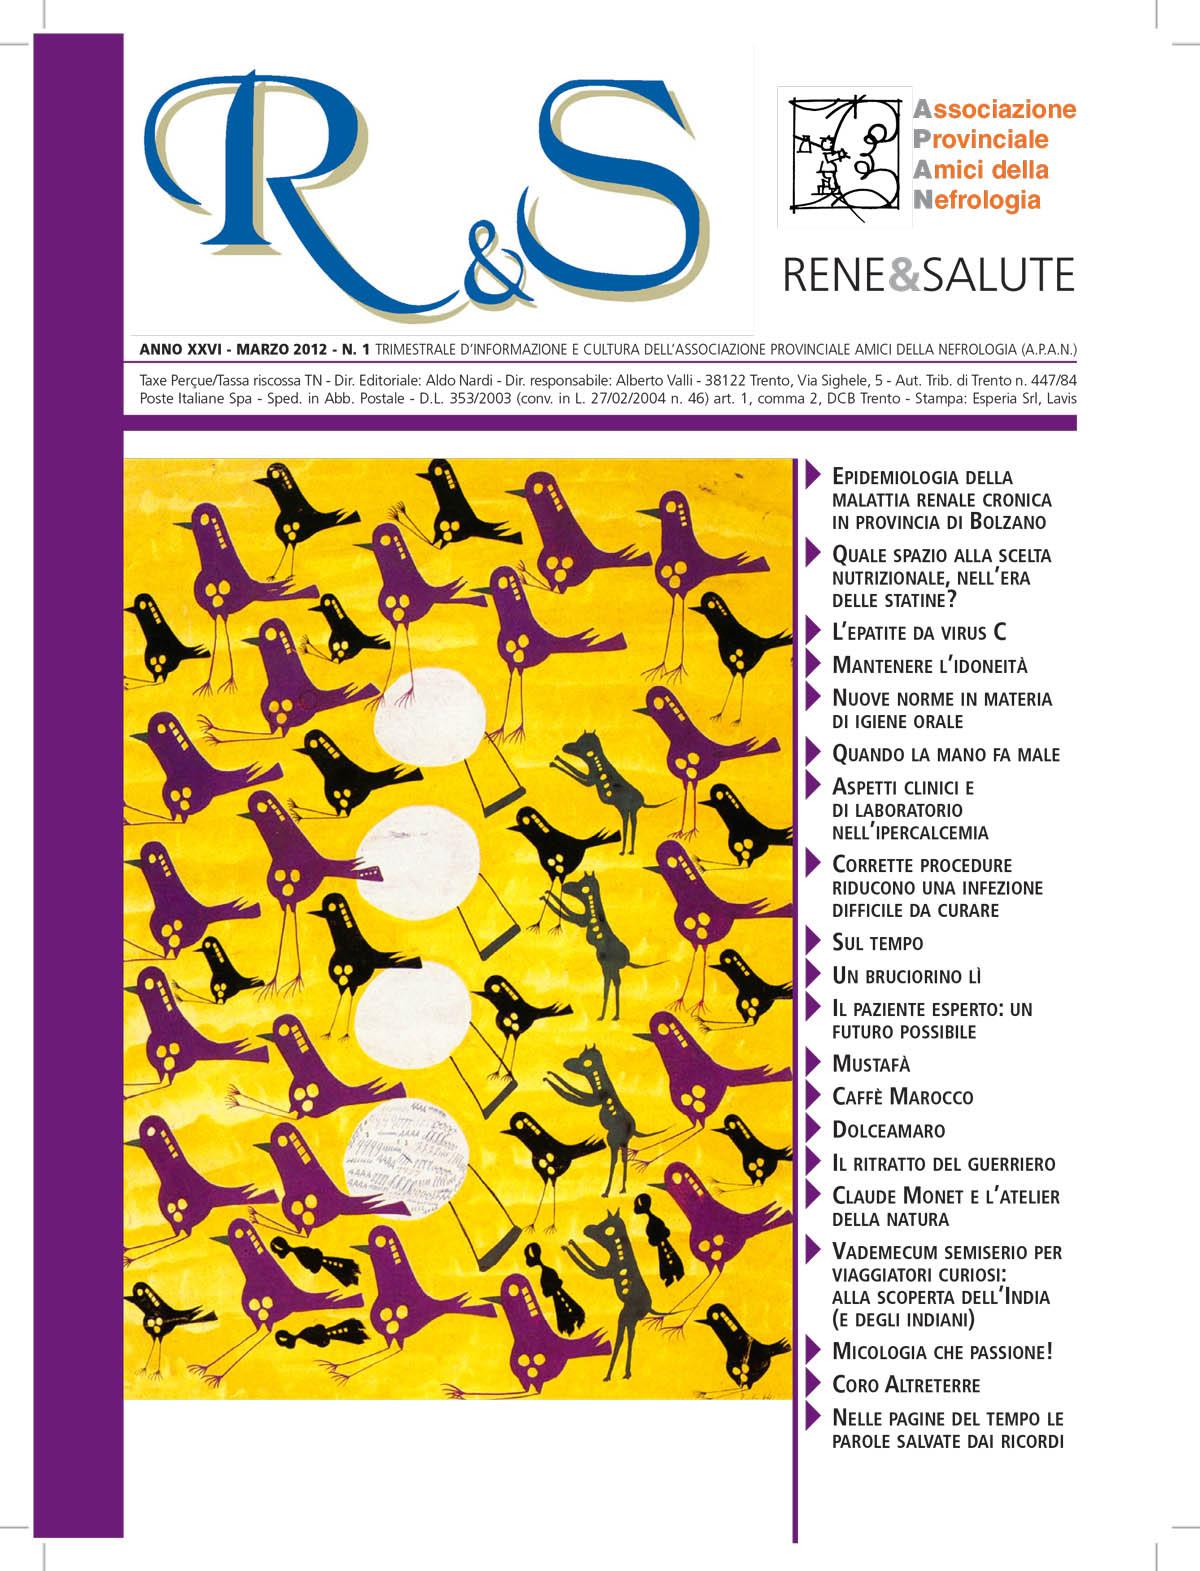 Rene & Salute 2012.1